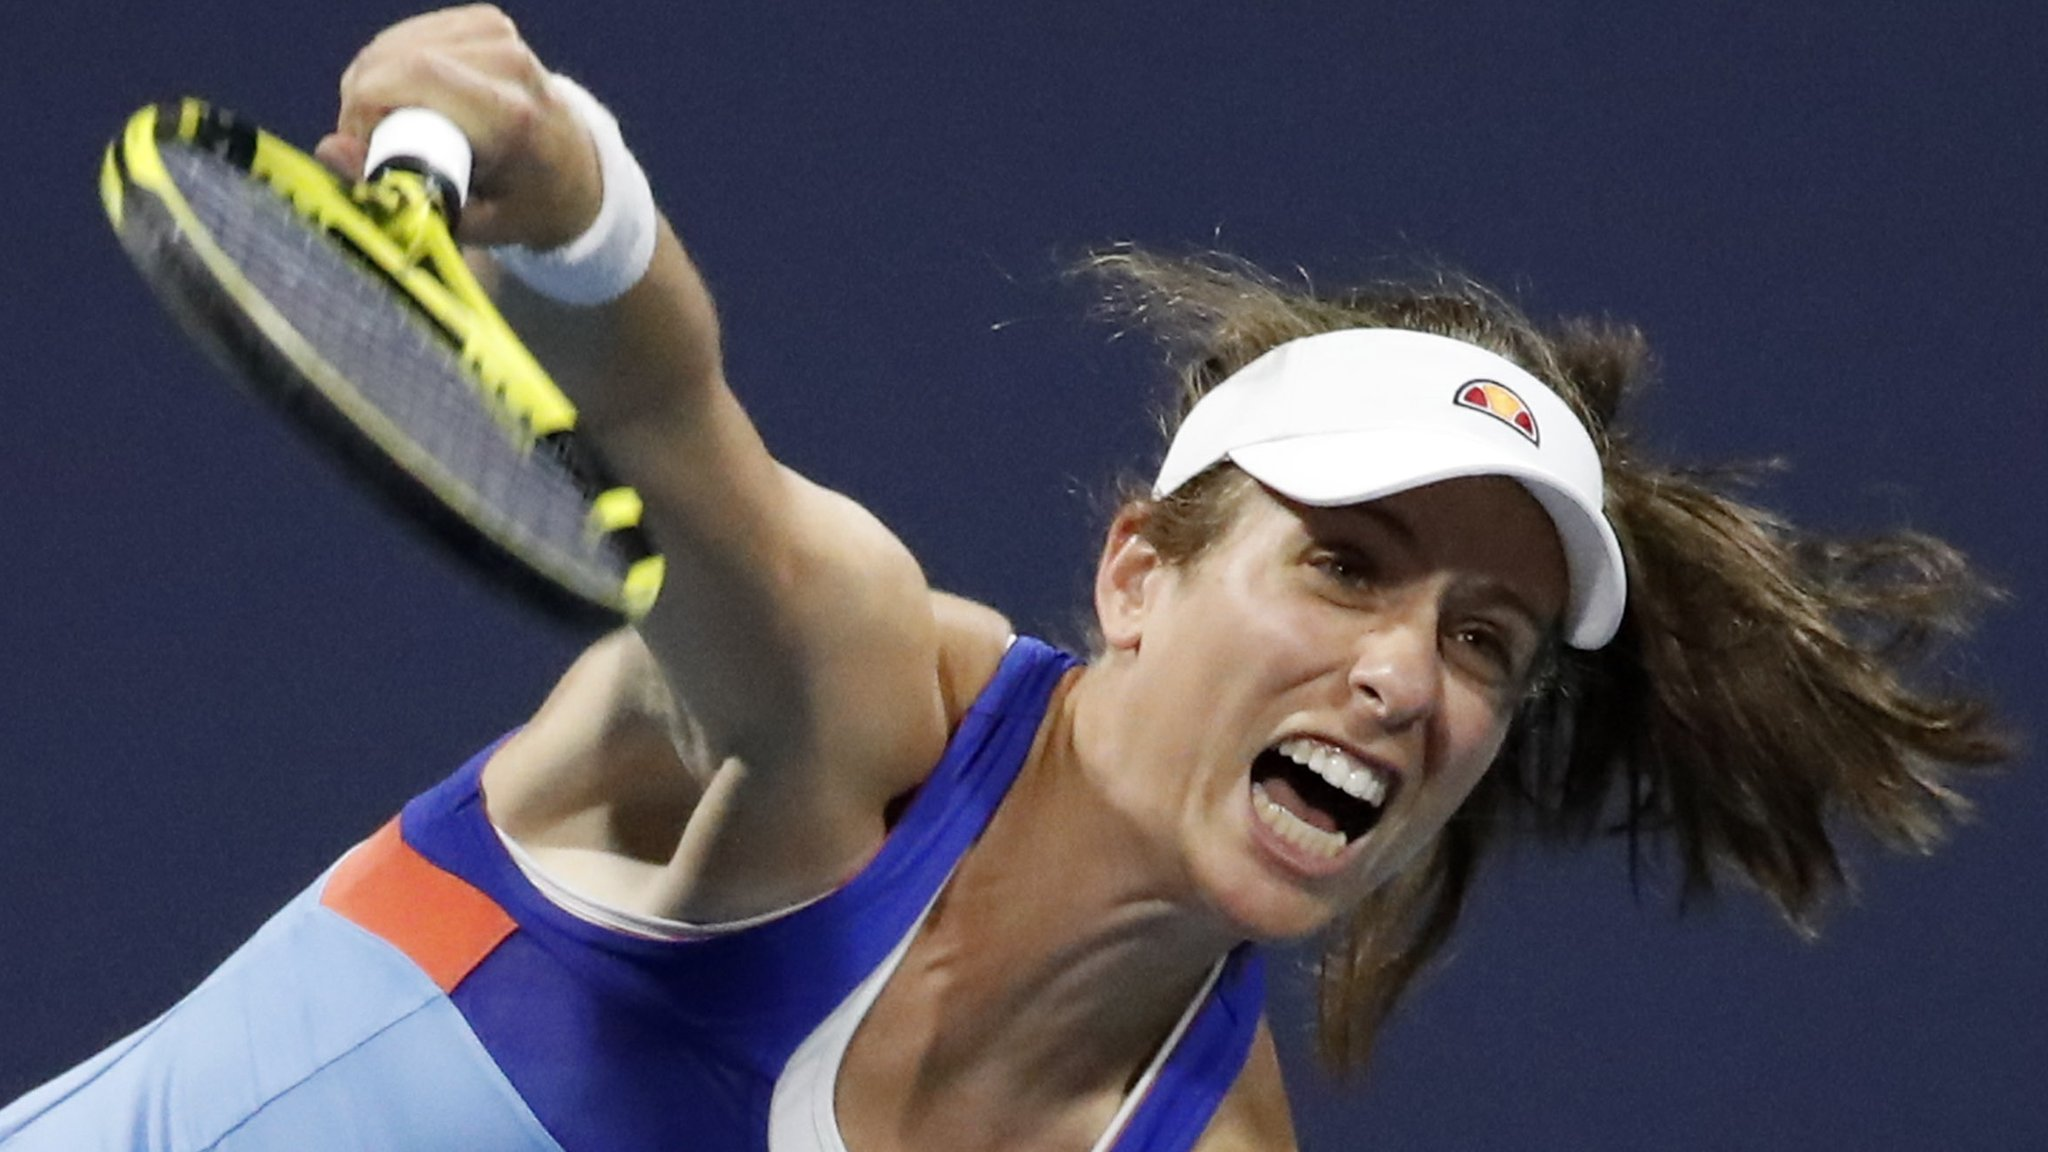 Johanna Konta into Miami Open second round after beating Jessica Pegula